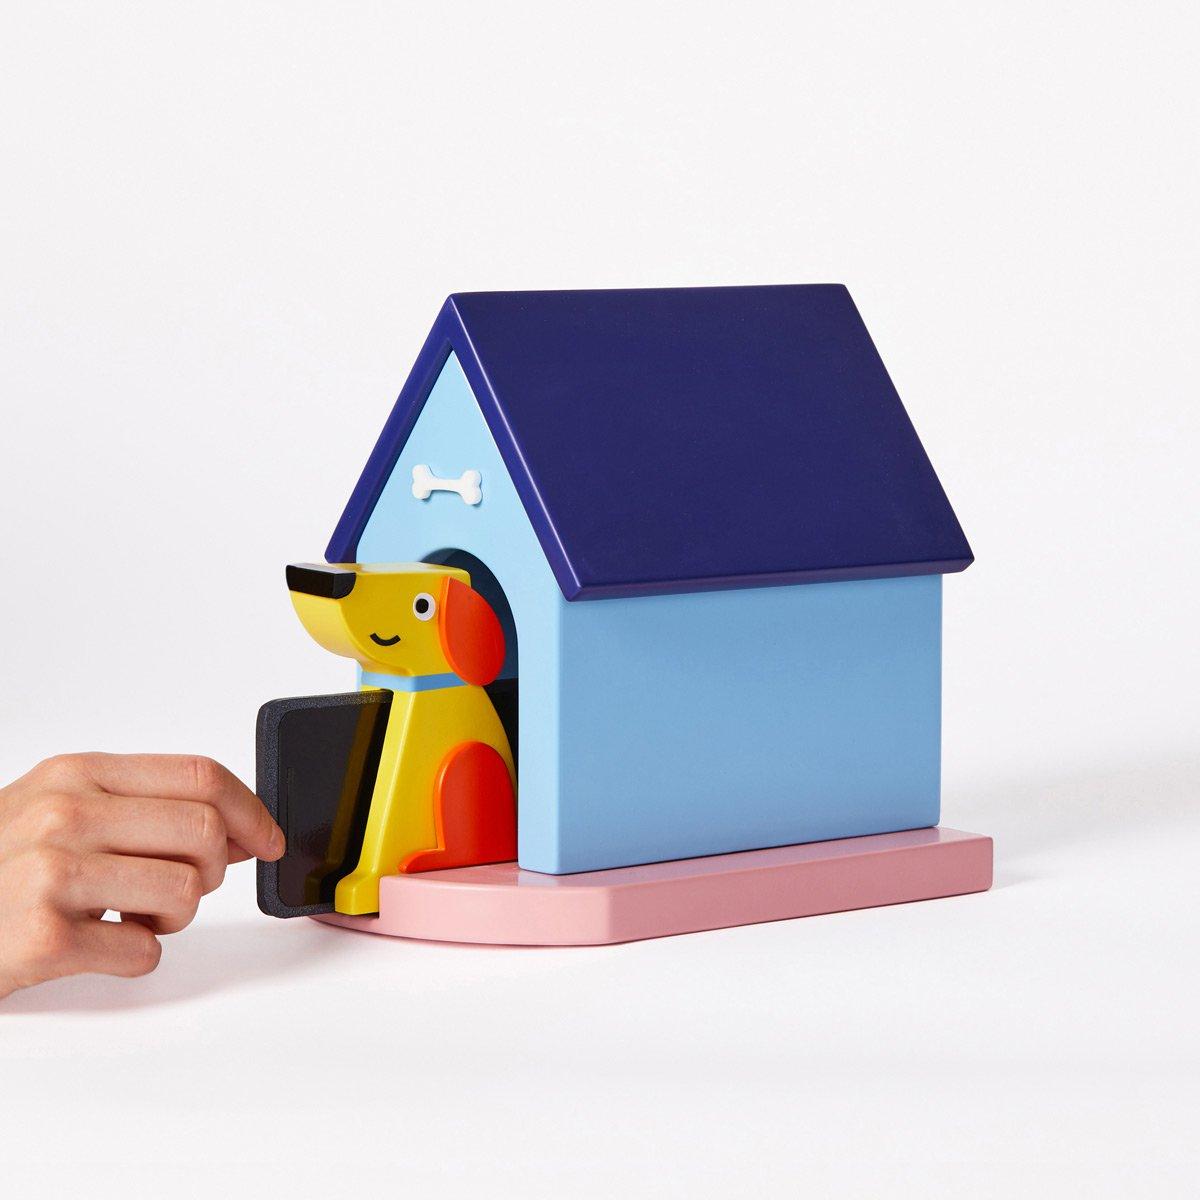 Microsoft mobile phone doghouse